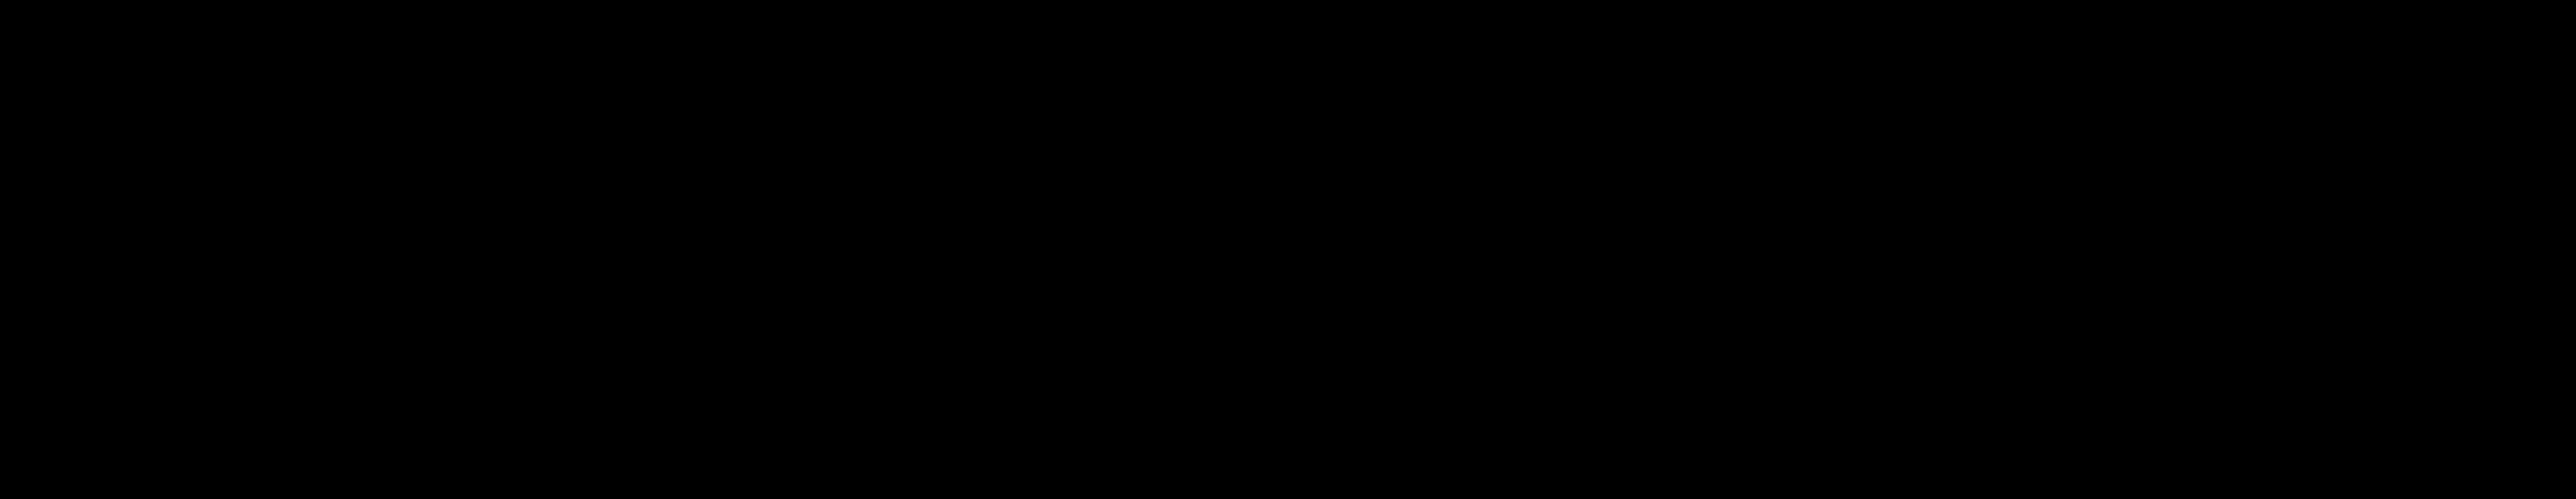 wcs-black-r-logo-1